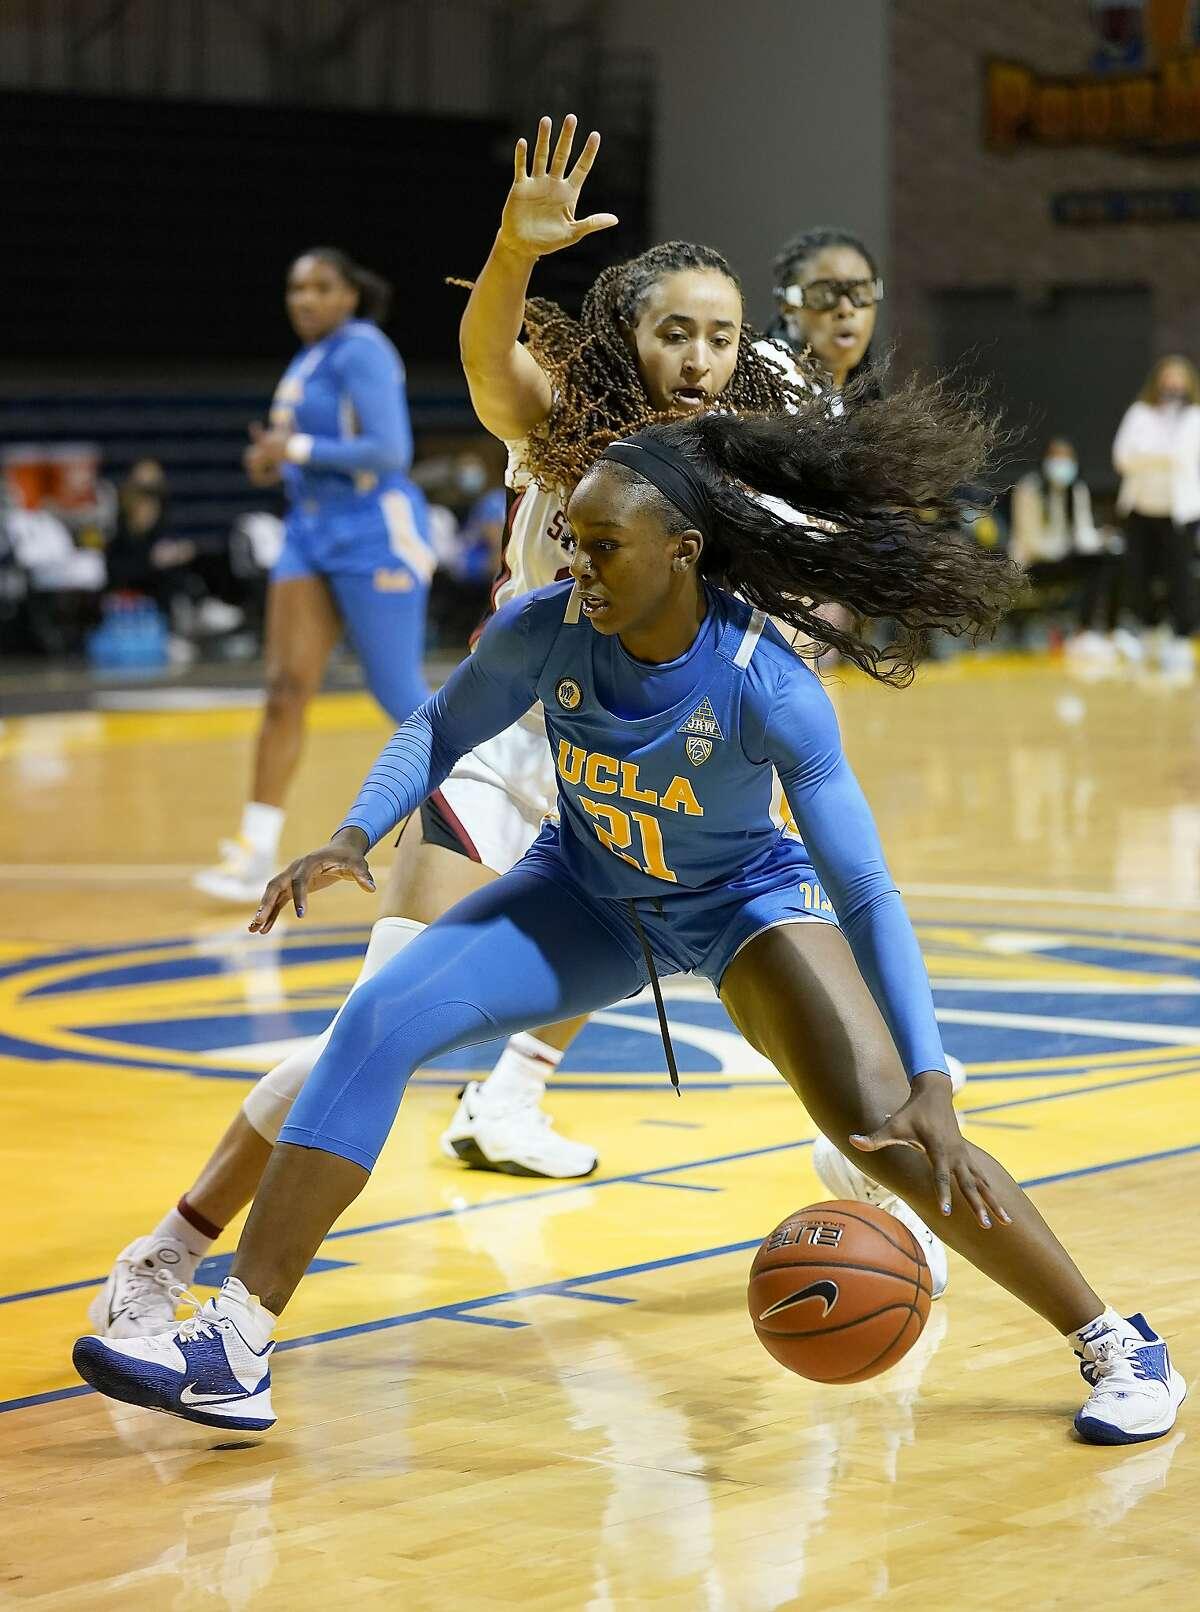 UCLA forward Michaela Onyenwere (21) drives with the ball against Stanford guard Haley Jones (30) during the first half of an NCAA college basketball game in Santa Cruz, Calif., Friday, Jan. 22, 2021. (AP Photo/Tony Avelar)